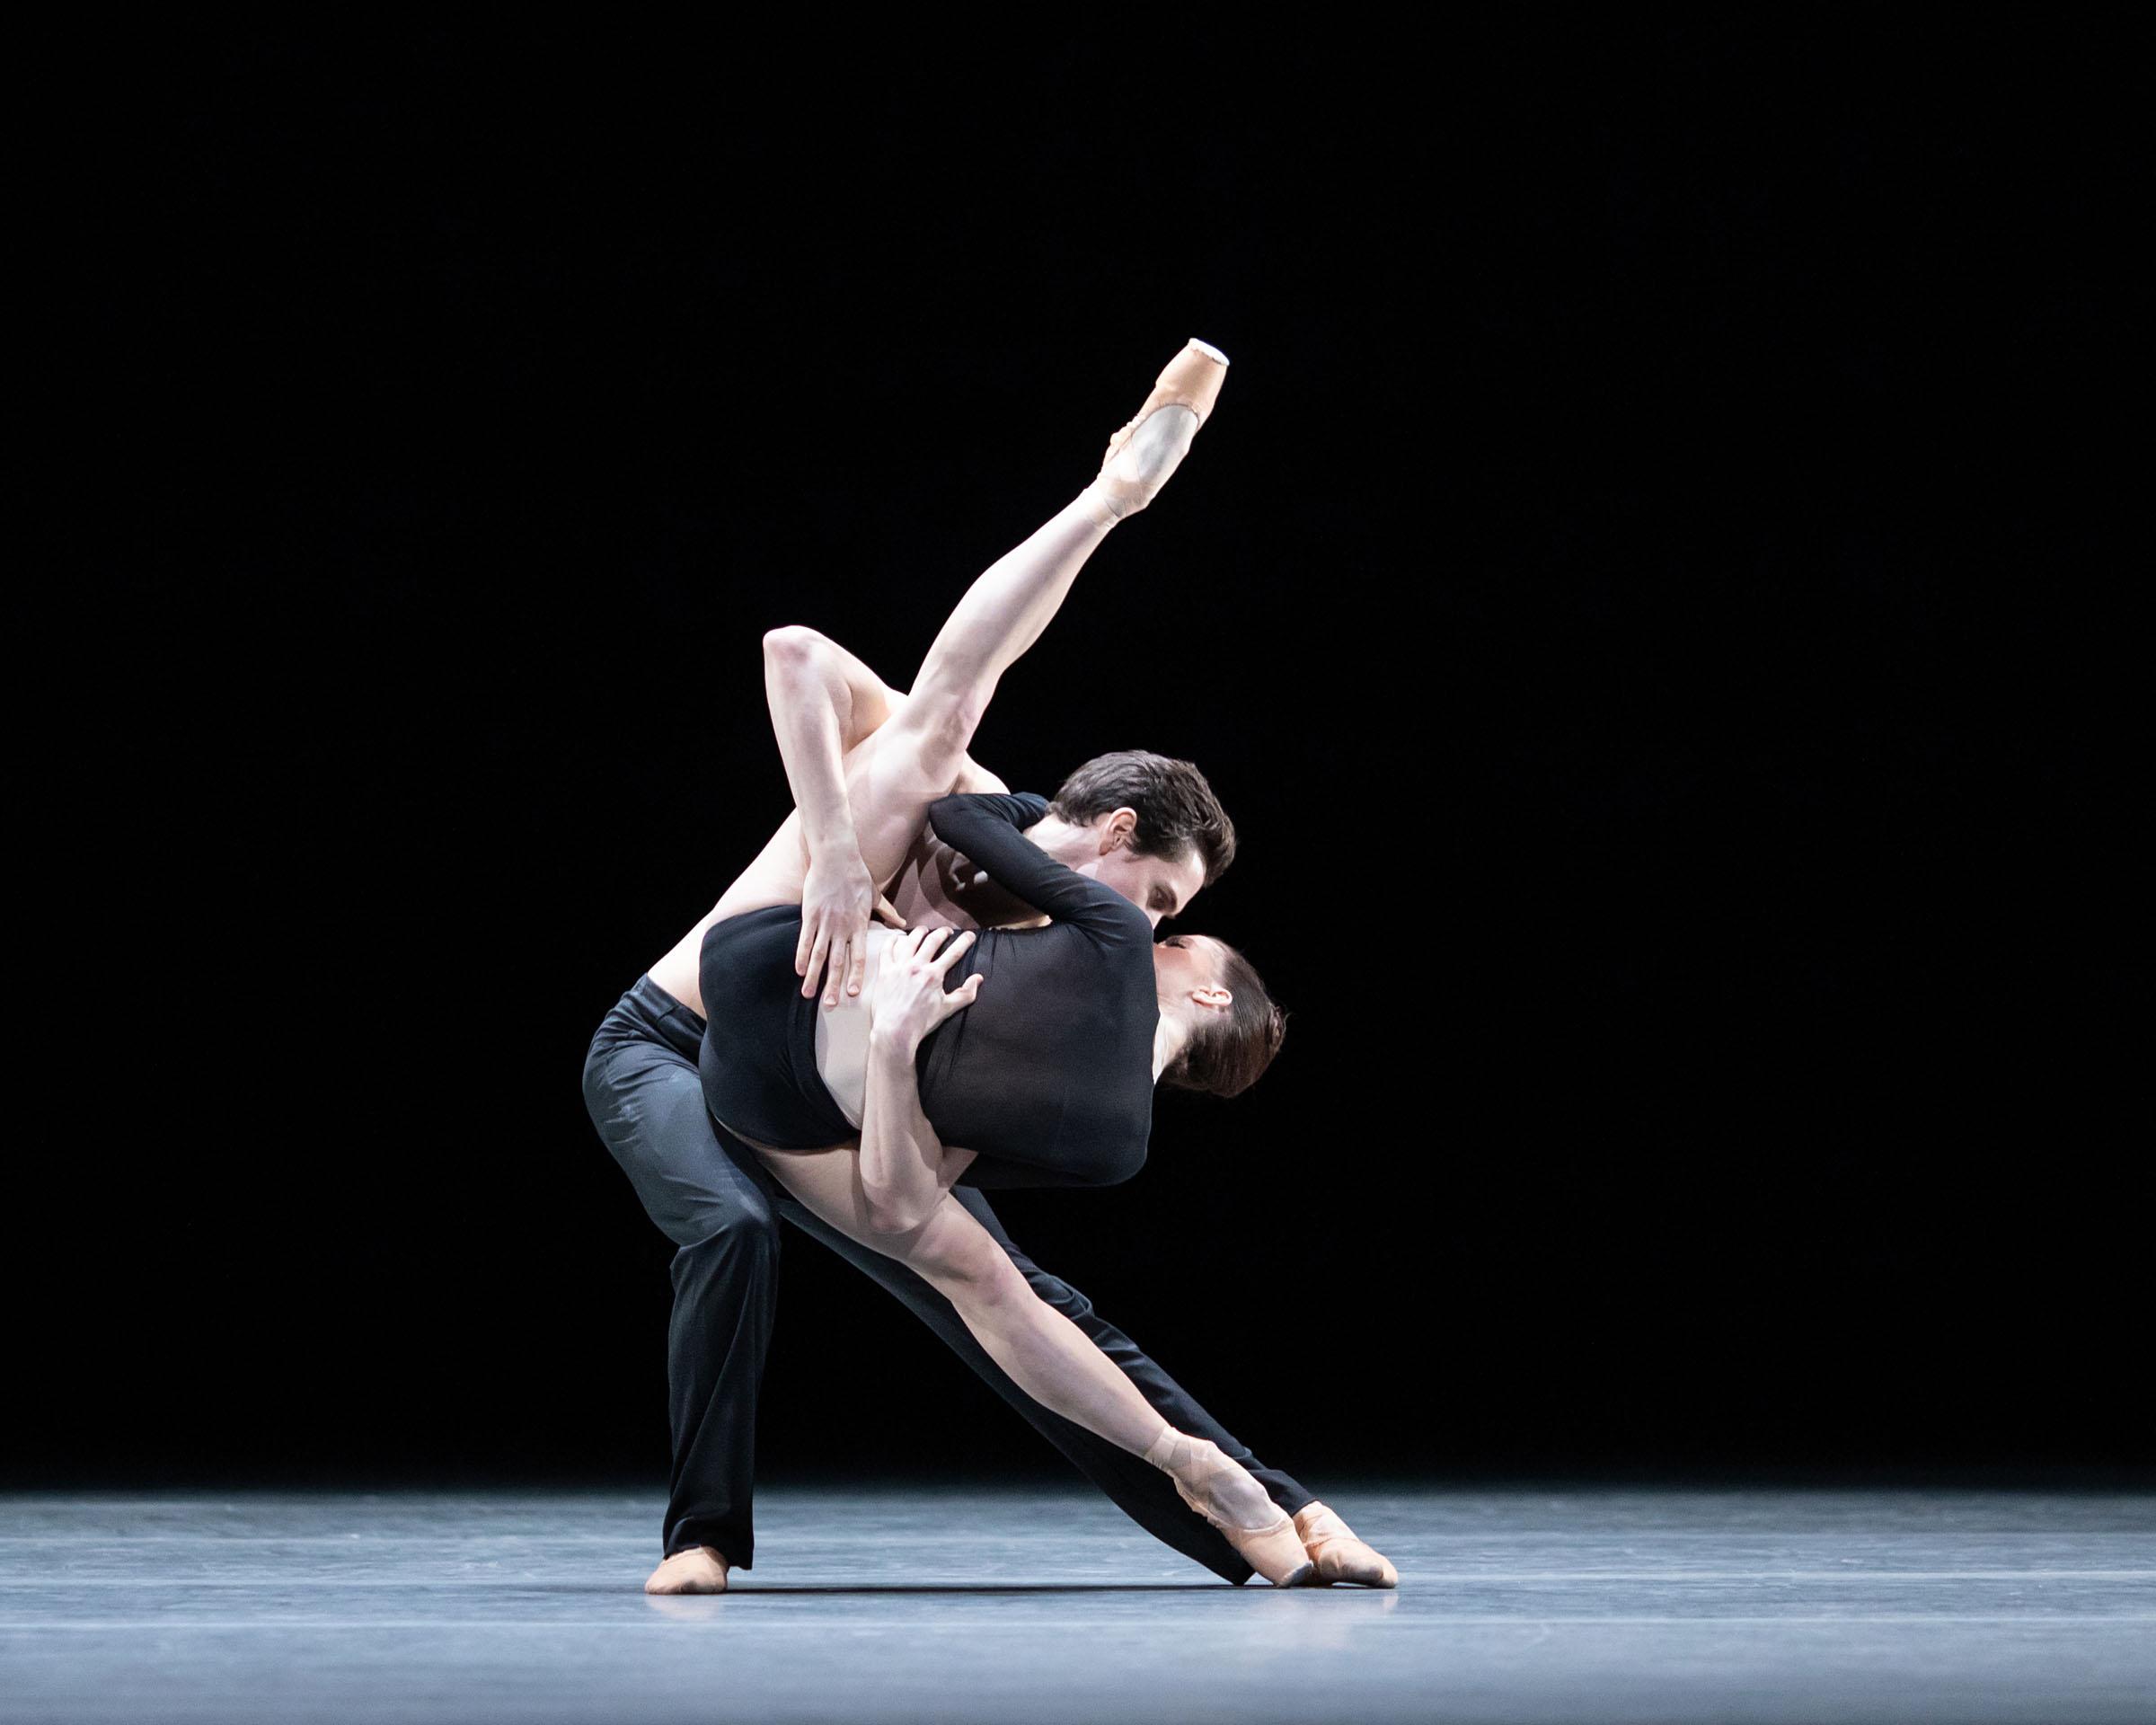 William Bracewell and Anna Rose O'Sullivan in Wayne McGregor's Infra, The Royal Ballet Season 2018/19